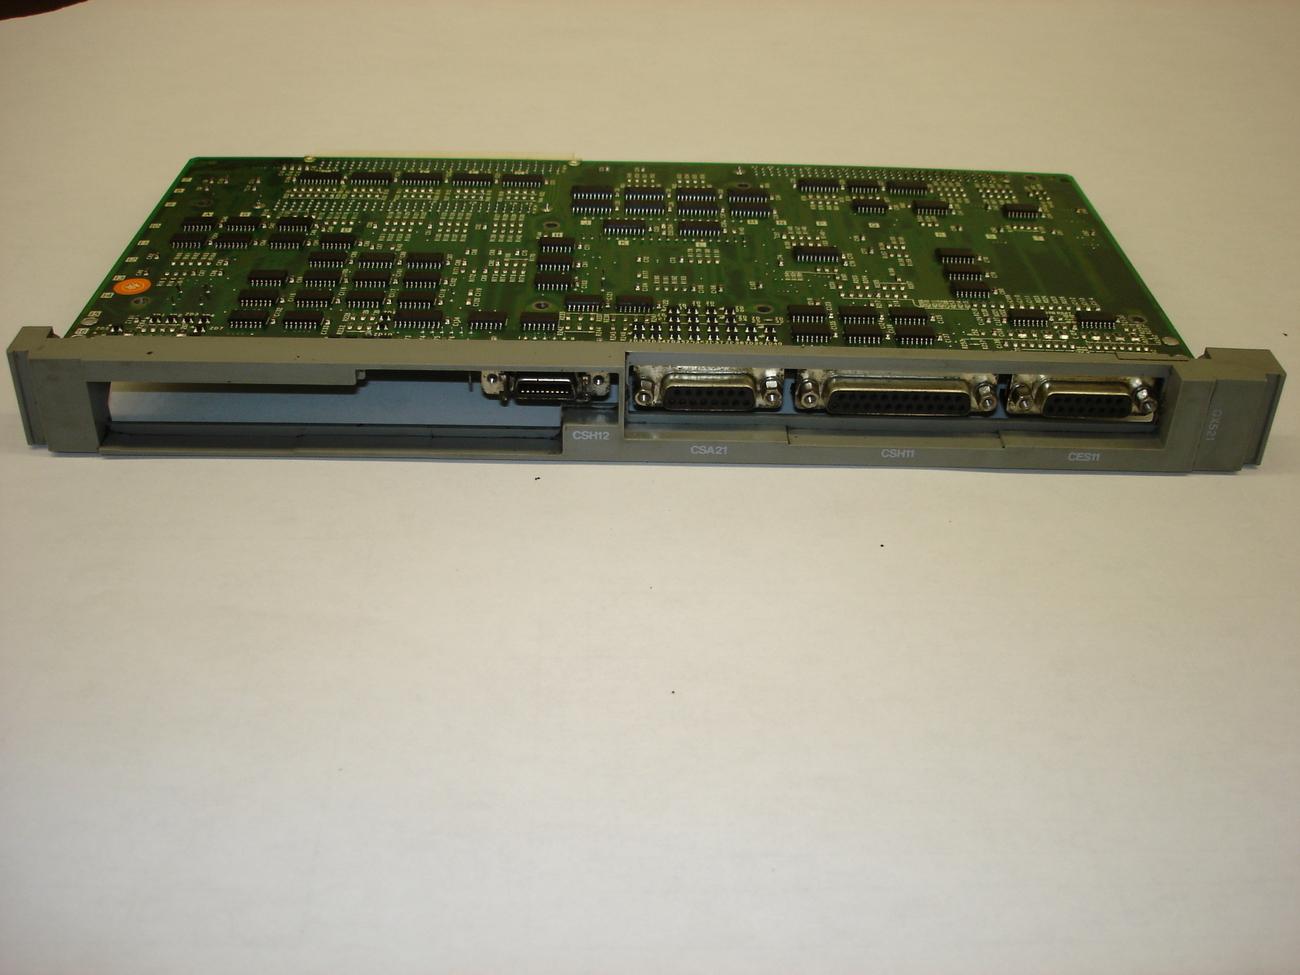 "Mitsubishi CRTC Module for 9"" CRT, QX521"